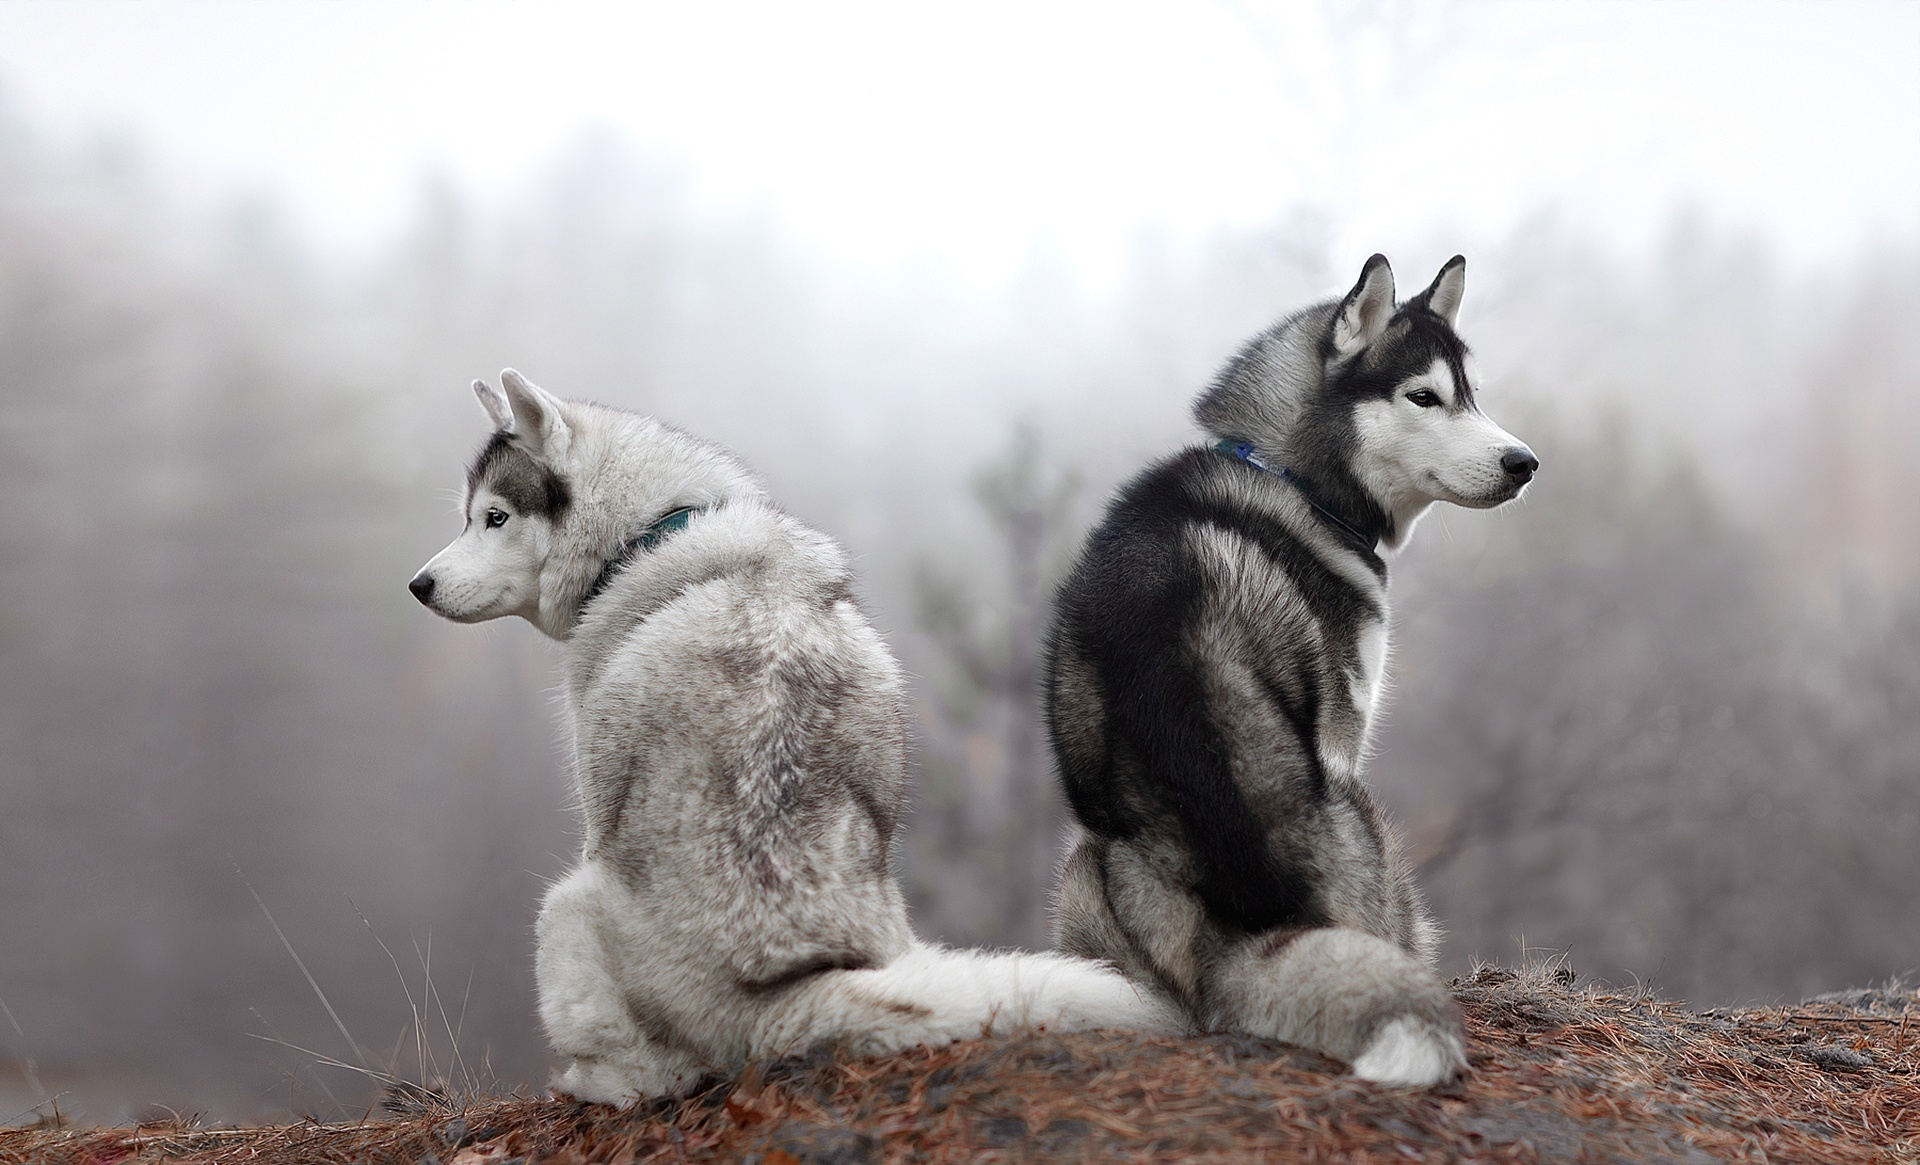 Картинка: Пара, собаки, хаски, порода, природа, сидят, холм, лес, туман